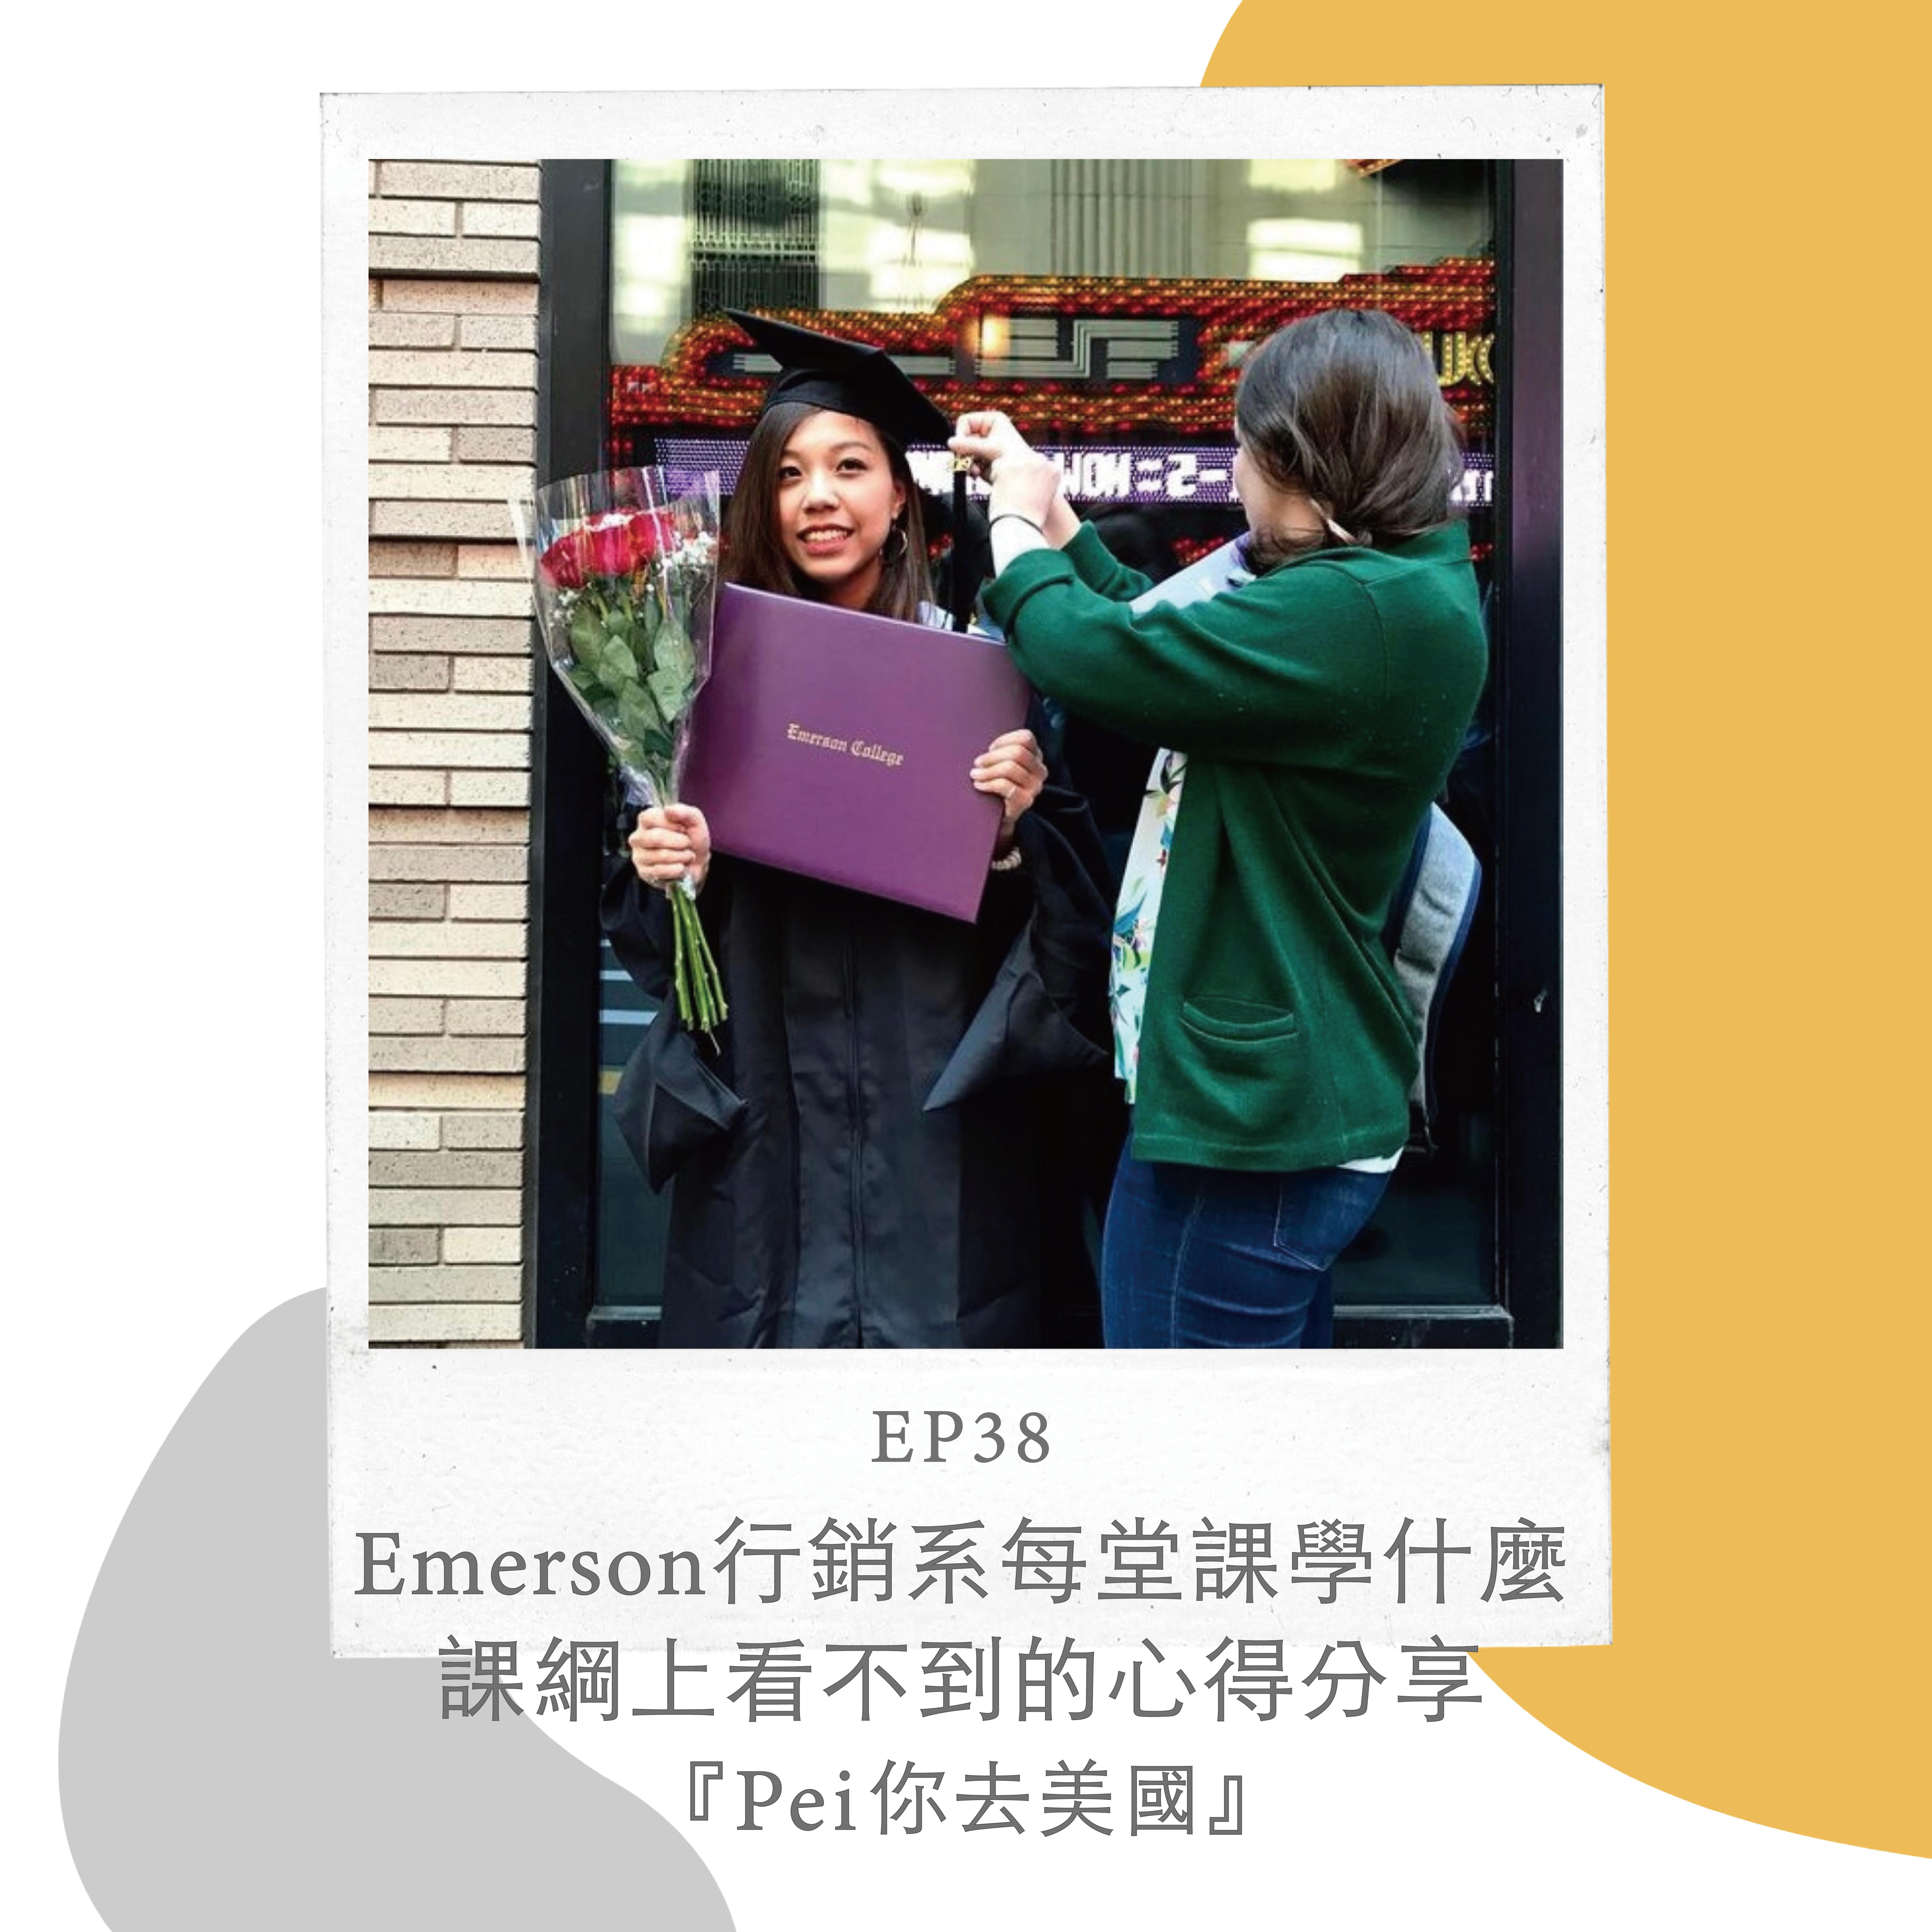 EP38『Pei你去美國』Emerson行銷系每堂課學什麼?課綱上看不到的心得分享 with Allison